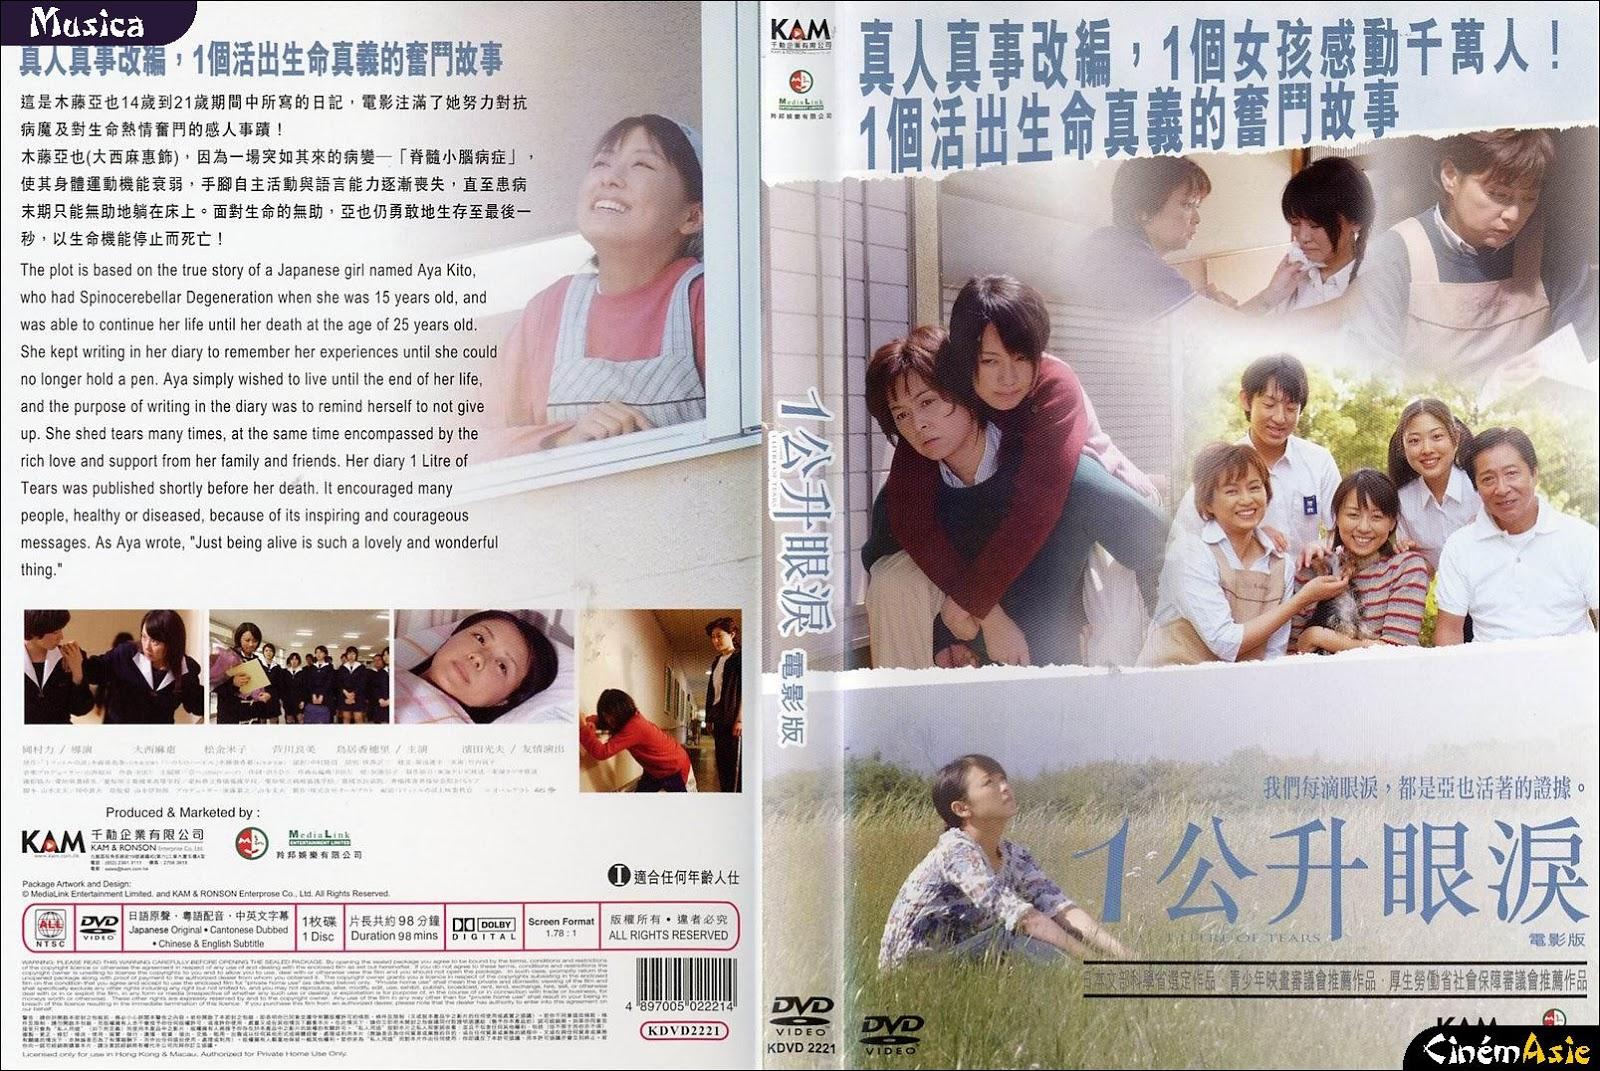 6 Film Jepang Romantis Yang Mengharukan | Riyadlul 'Ulum